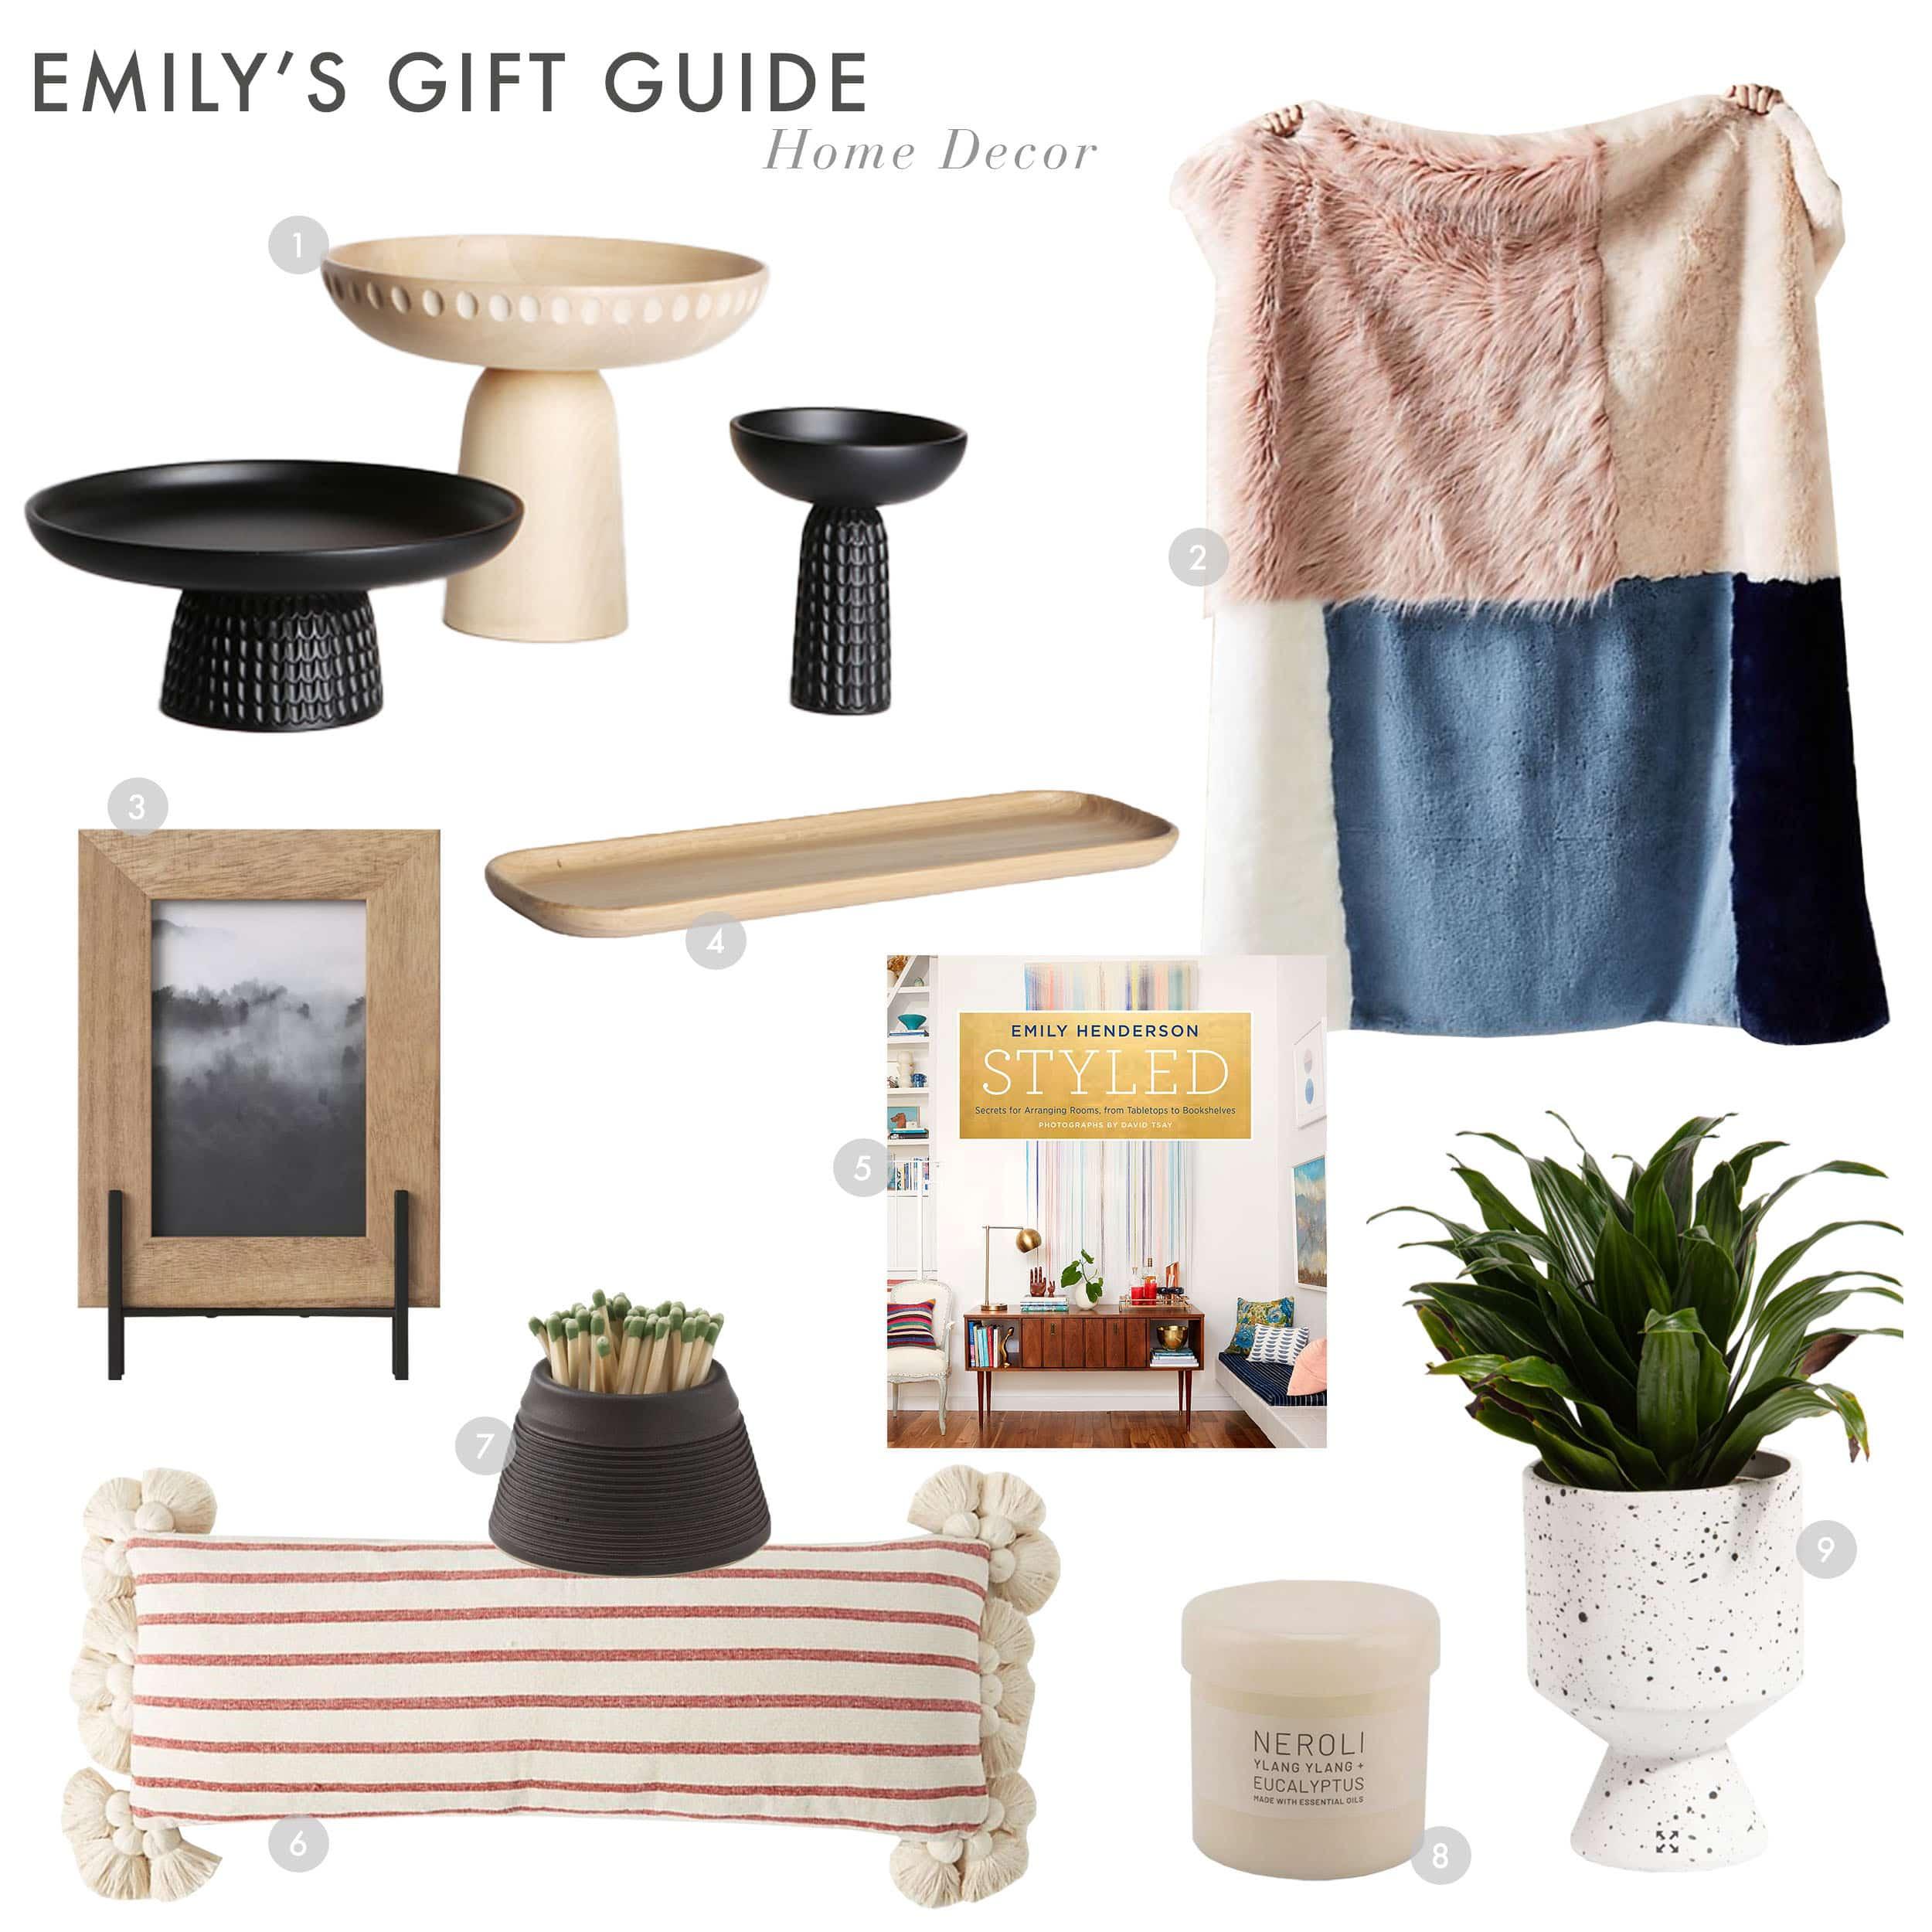 Emily Henderson Gg Home Decor 1 1